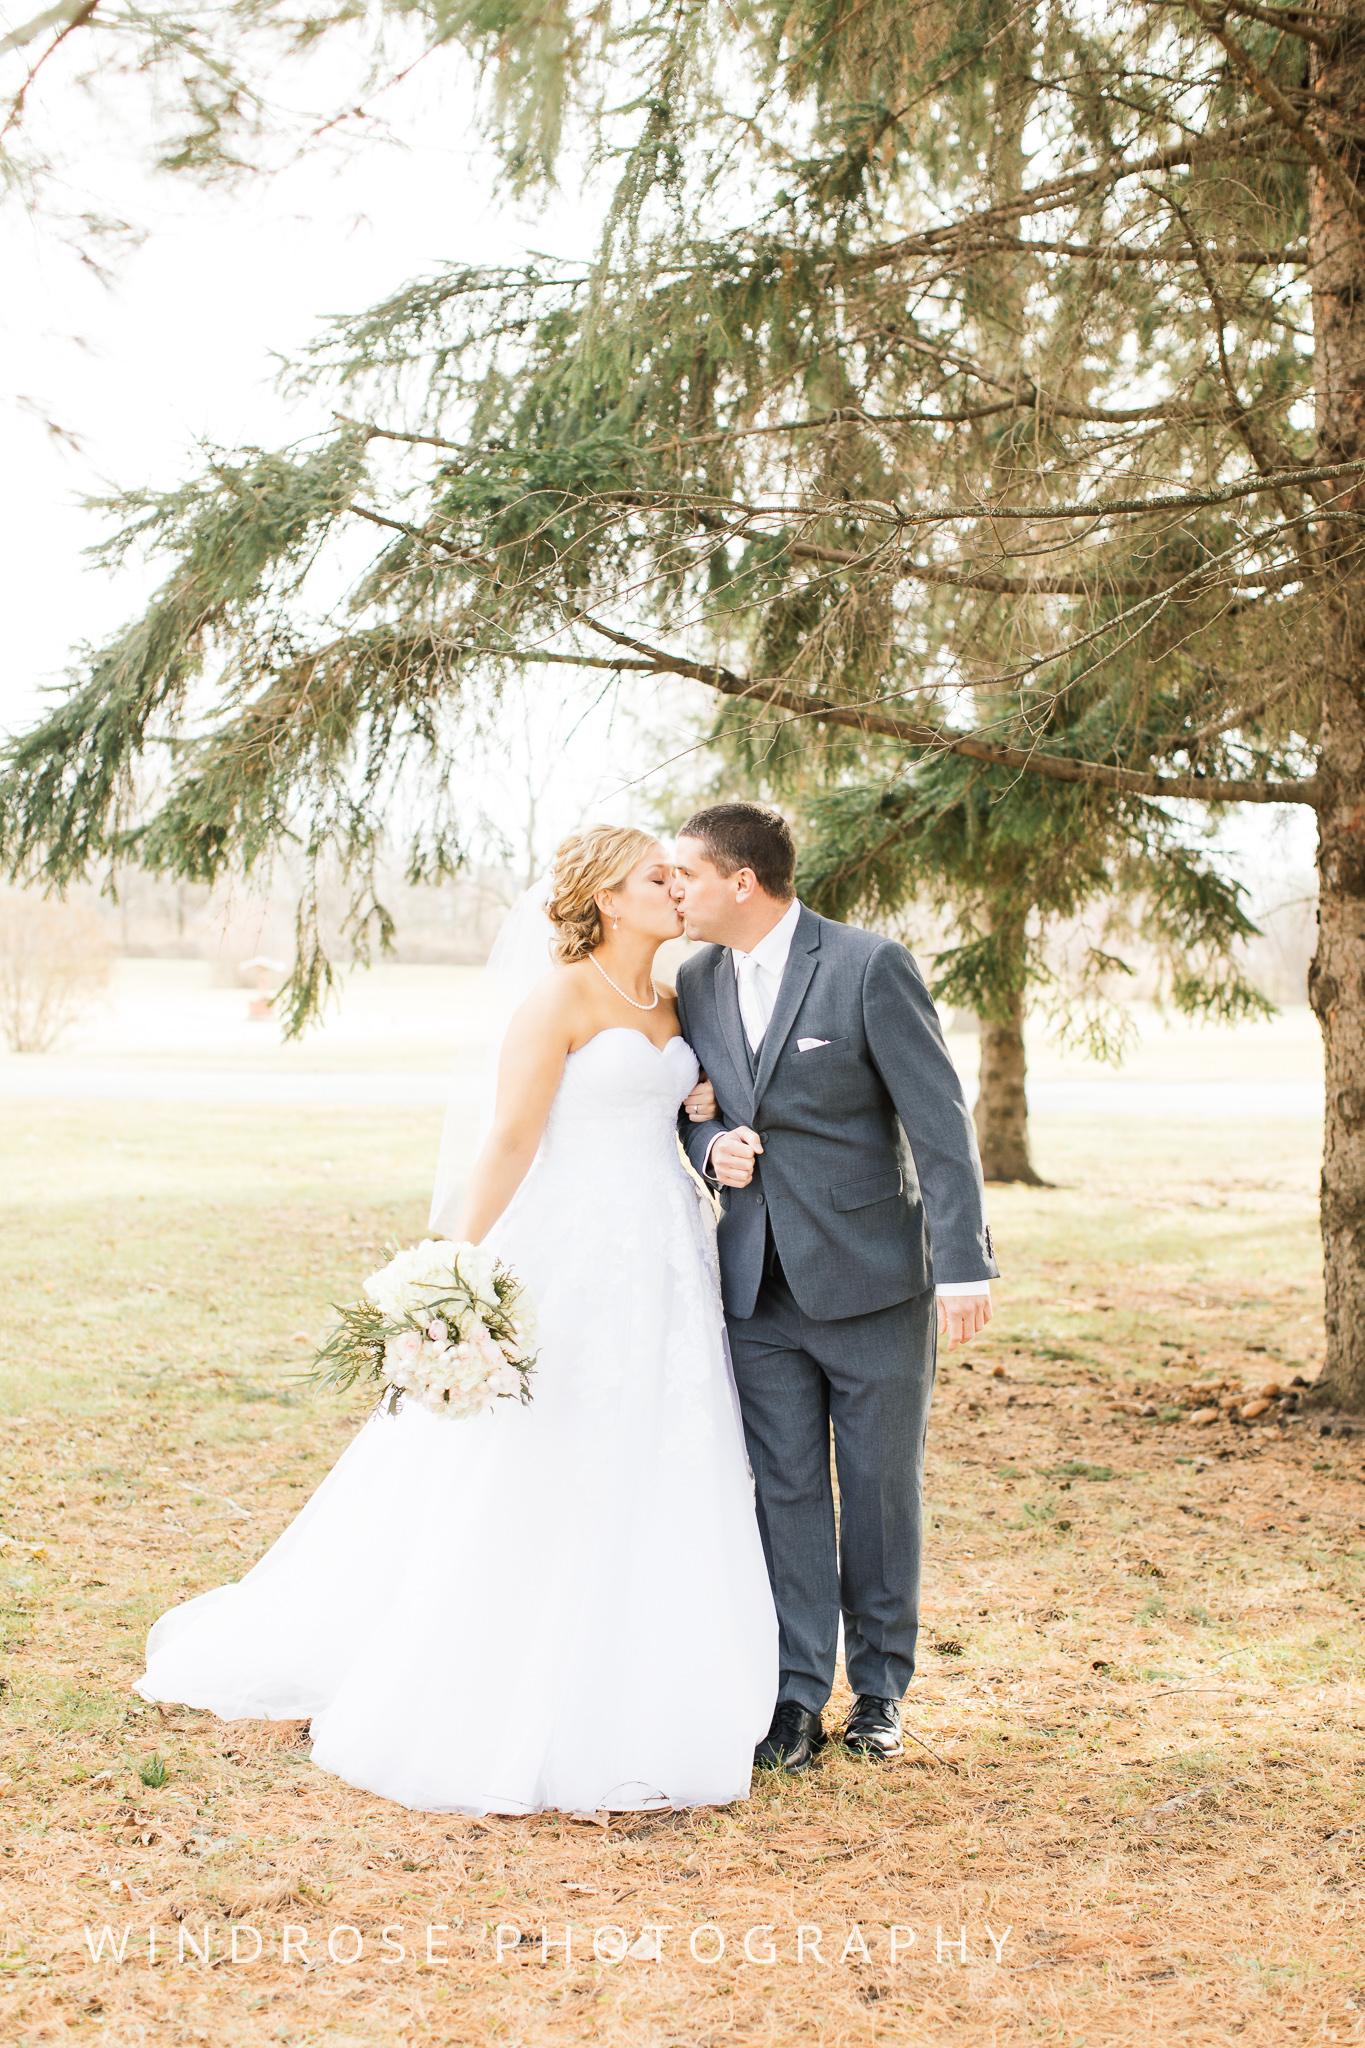 Rochester-MN-Wedding-Photo-10.jpg